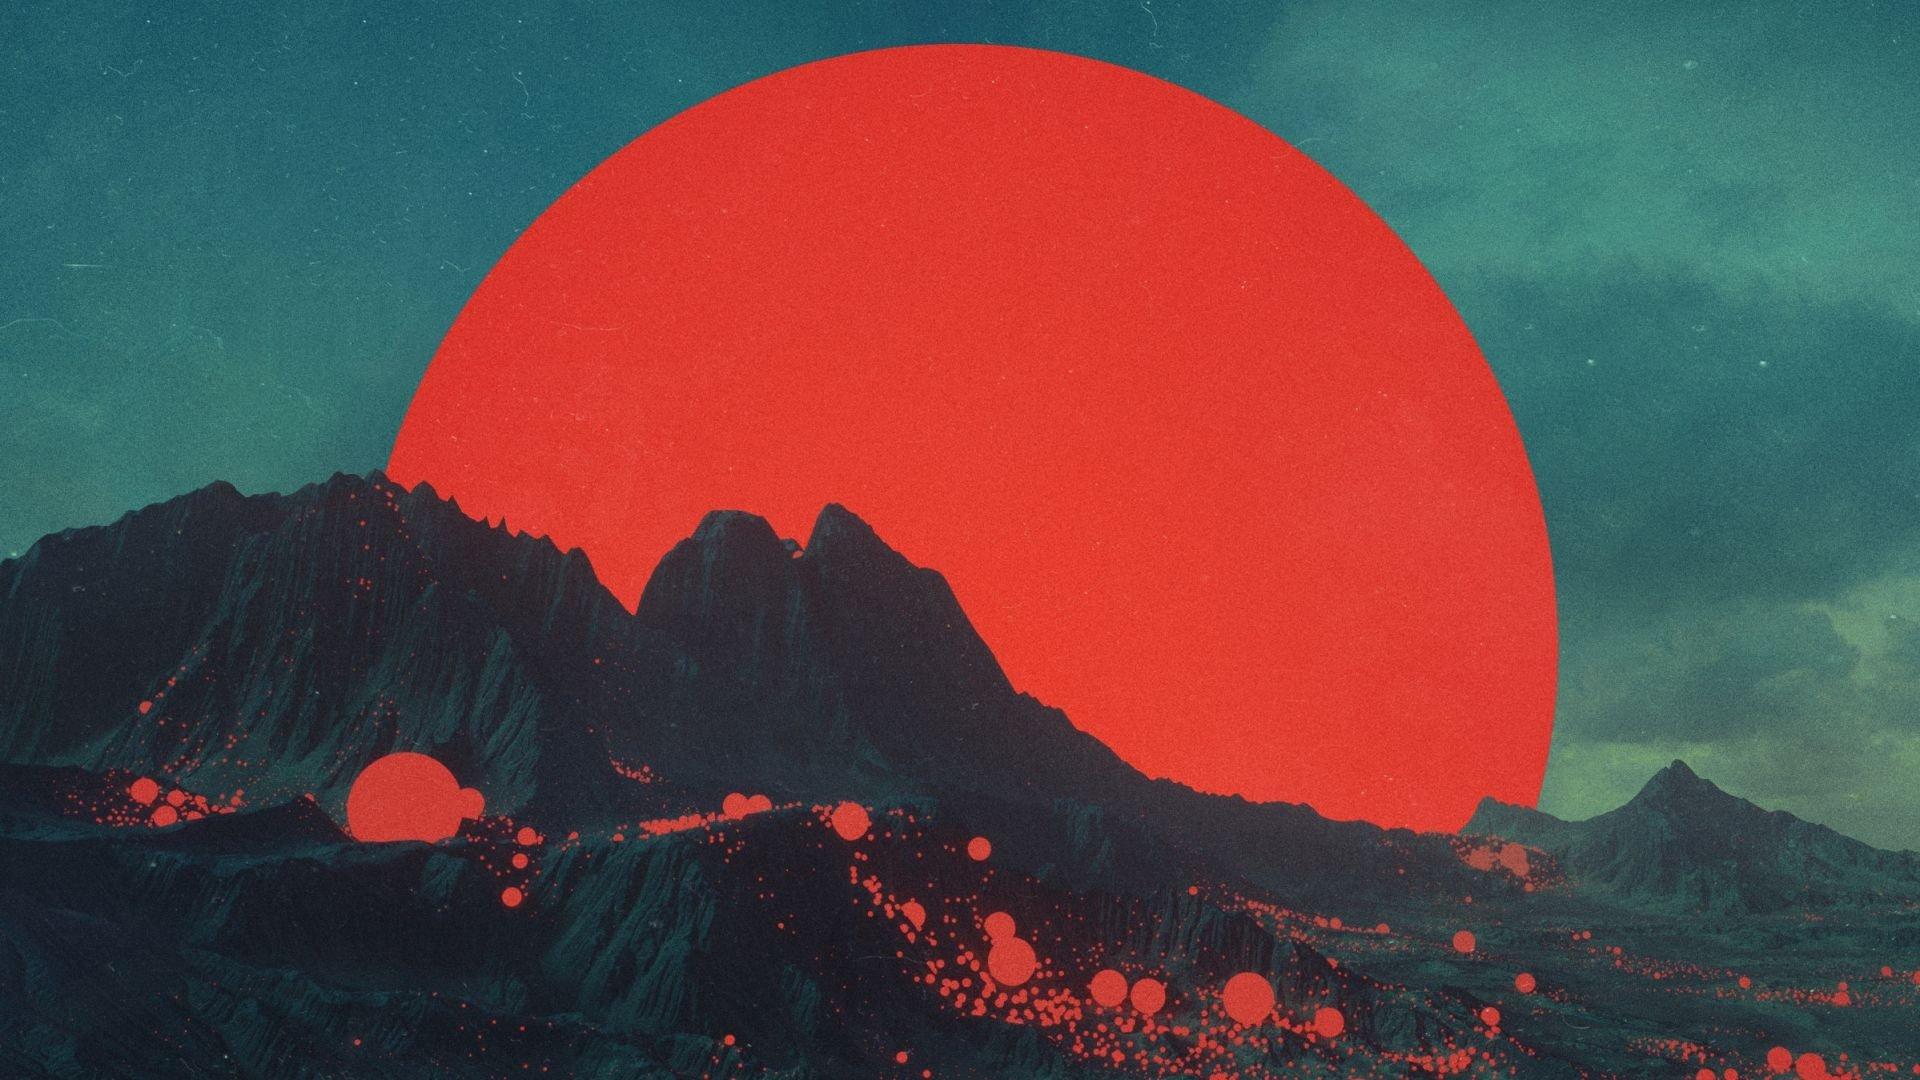 Aesthetic Moon Wallpaper Image